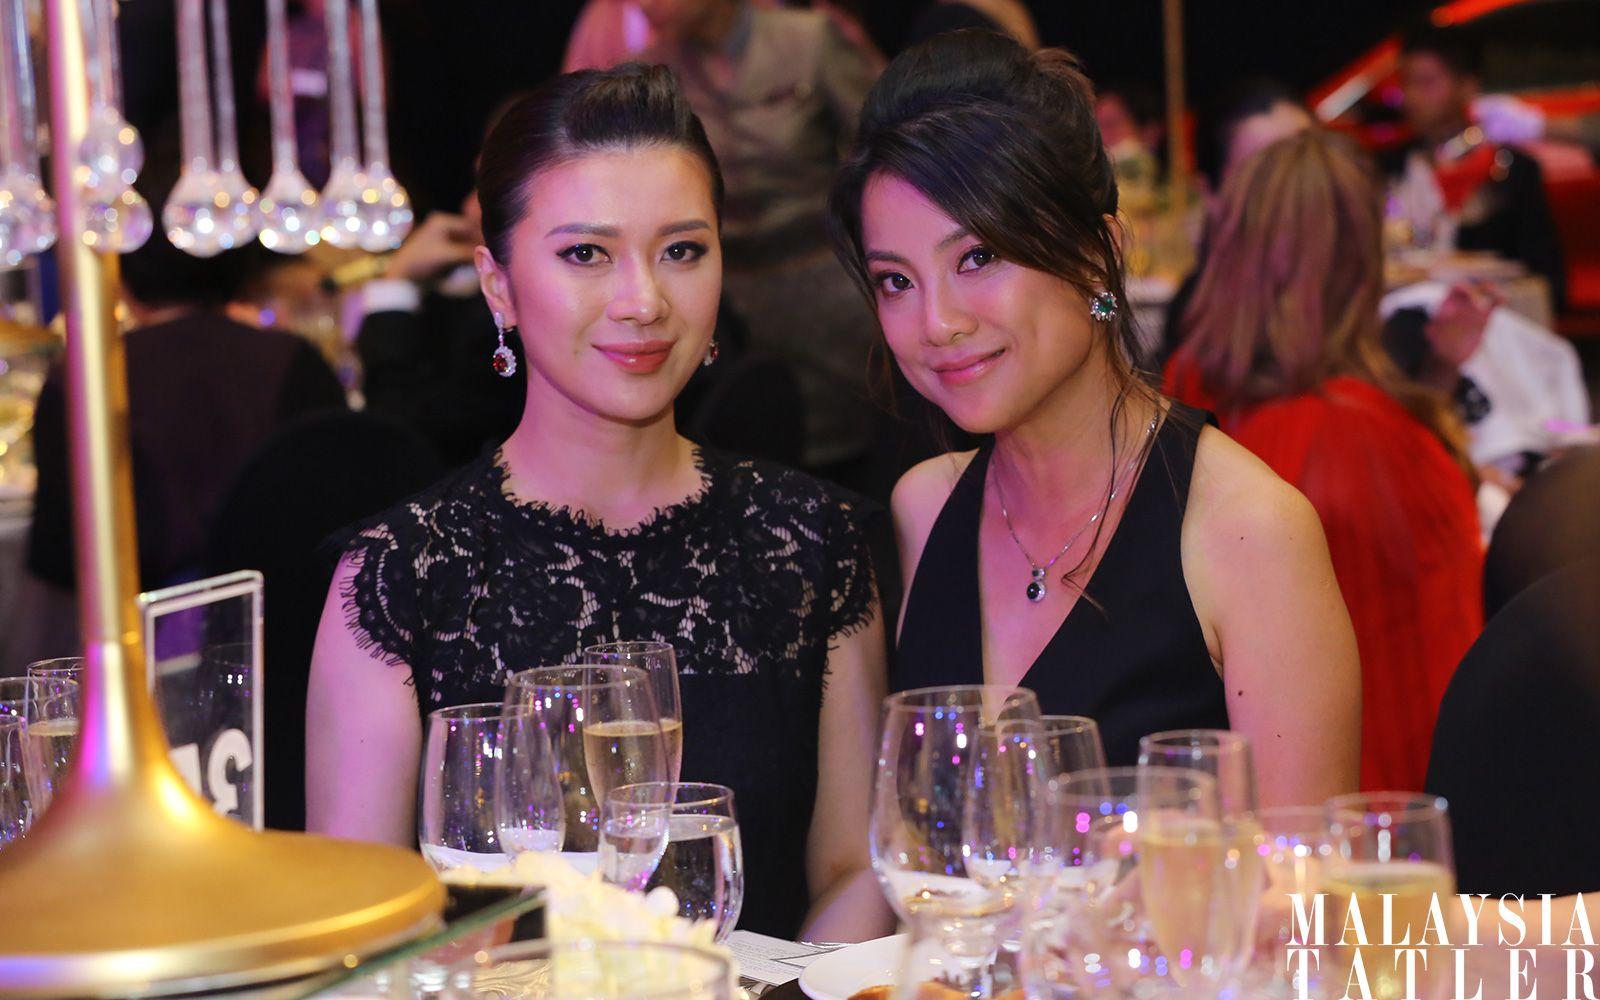 Michelle Ang and Lee Huei Min